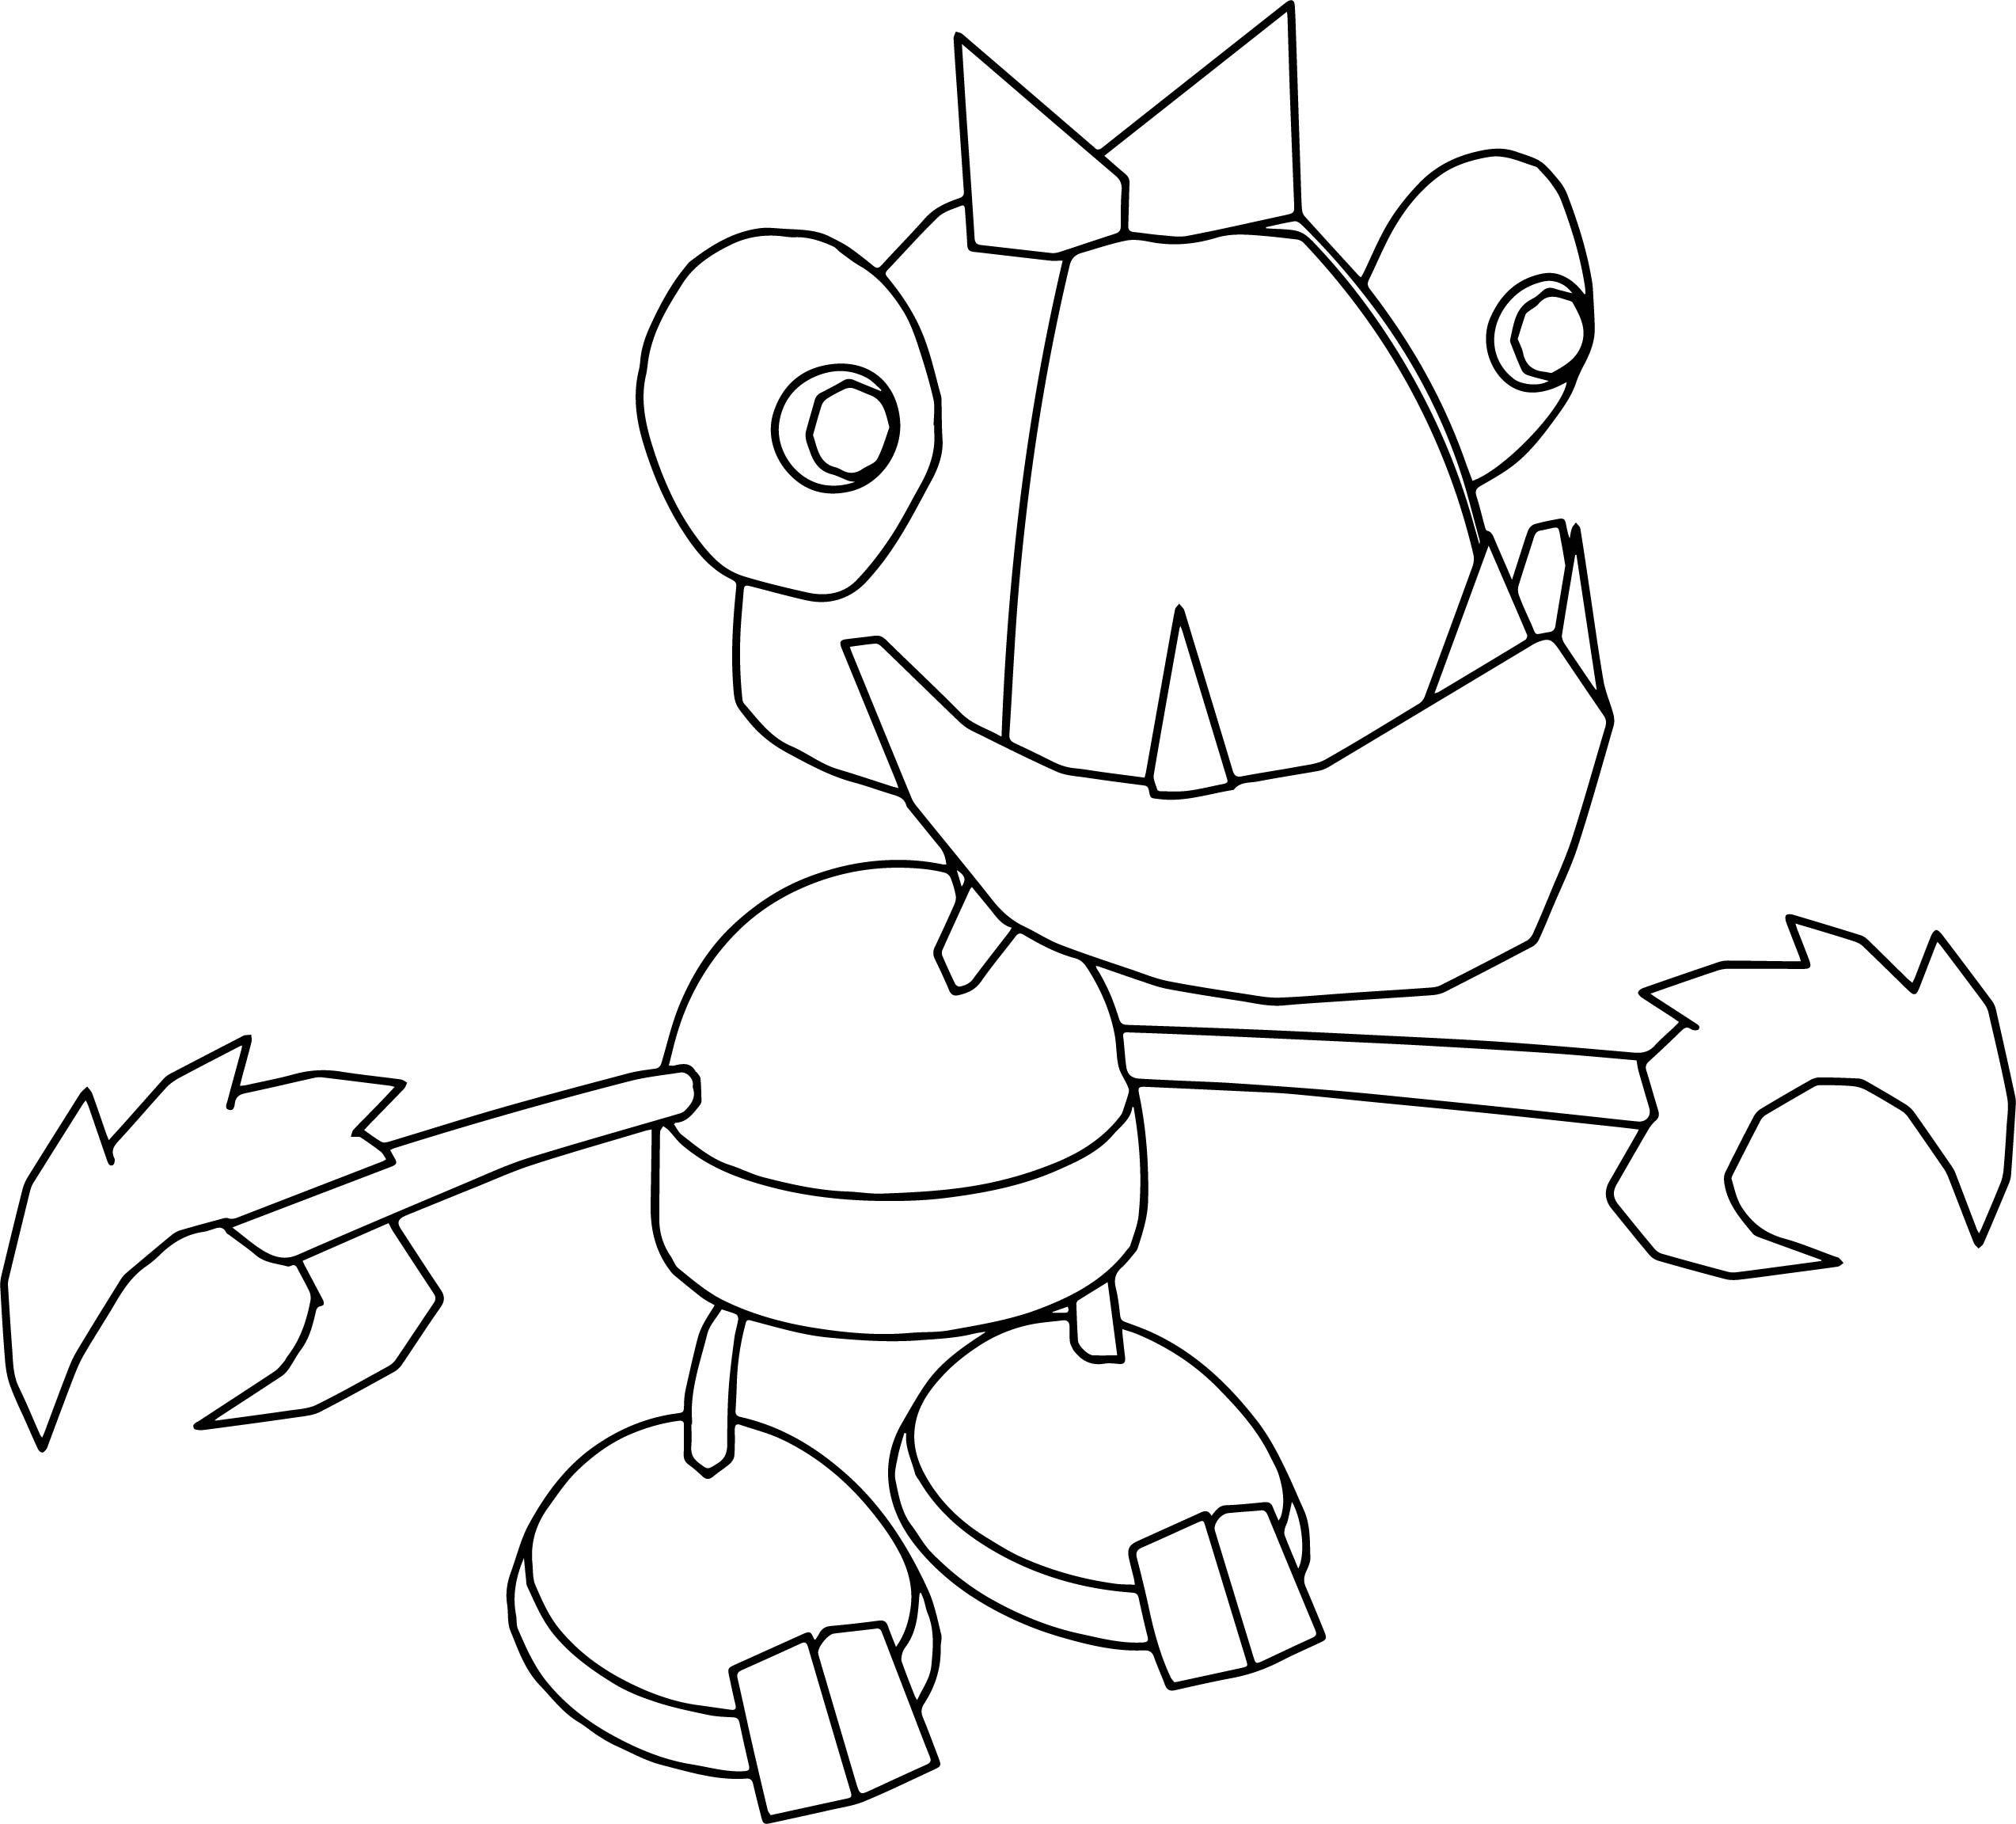 Cool Shivor Robot Cartoon Coloring Page Robot Cartoon Cartoon Coloring Pages Coloring Pages